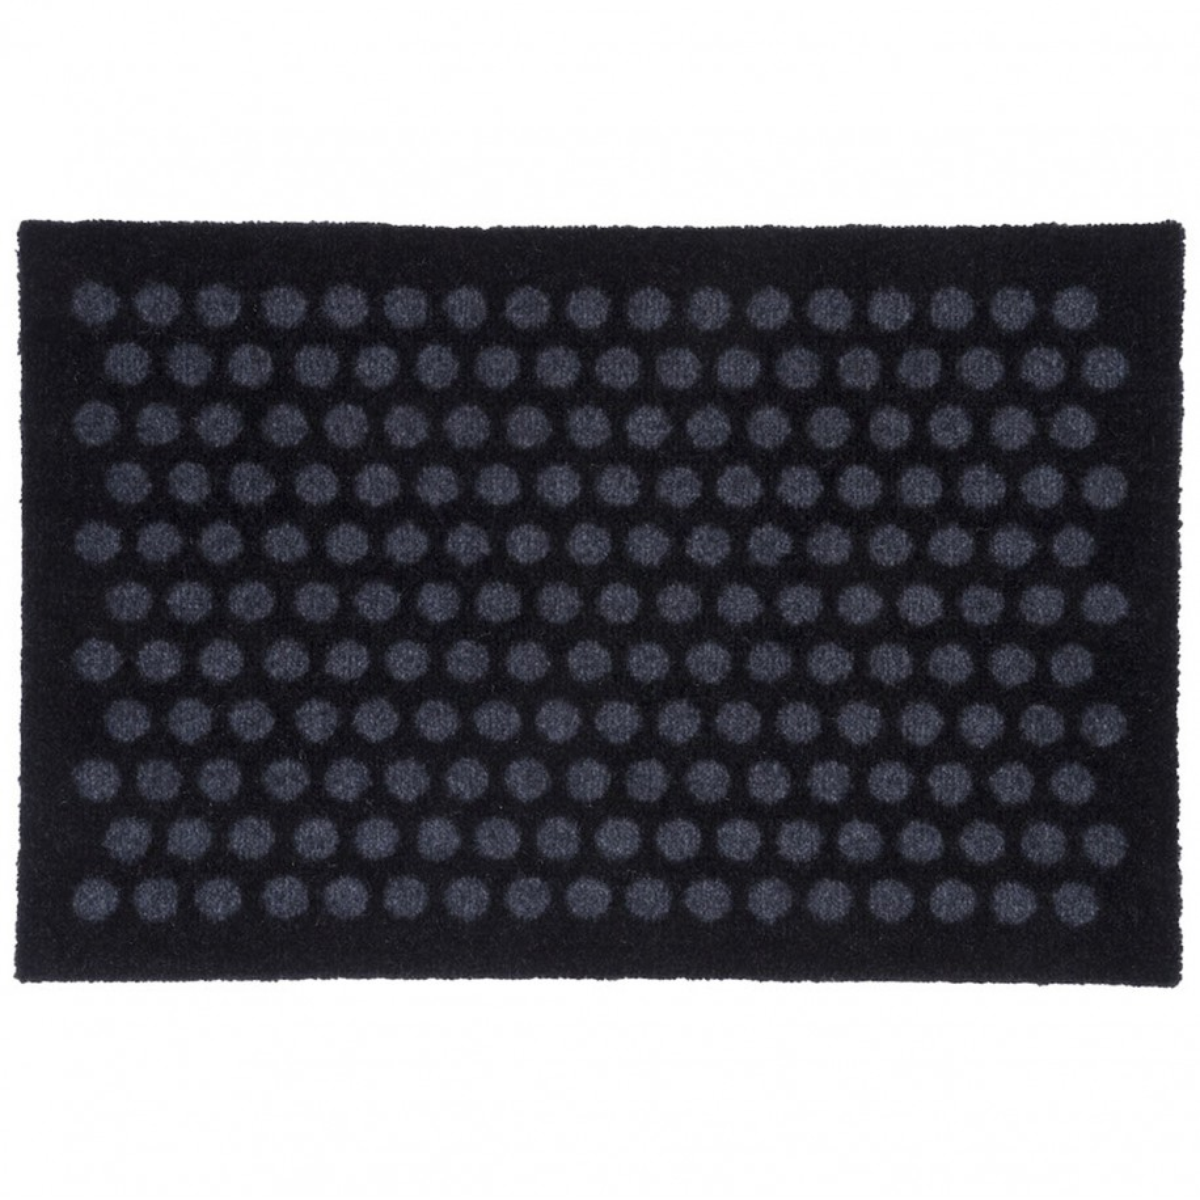 Tica dørmåtte, 40x60 - Prikker, sort/grå